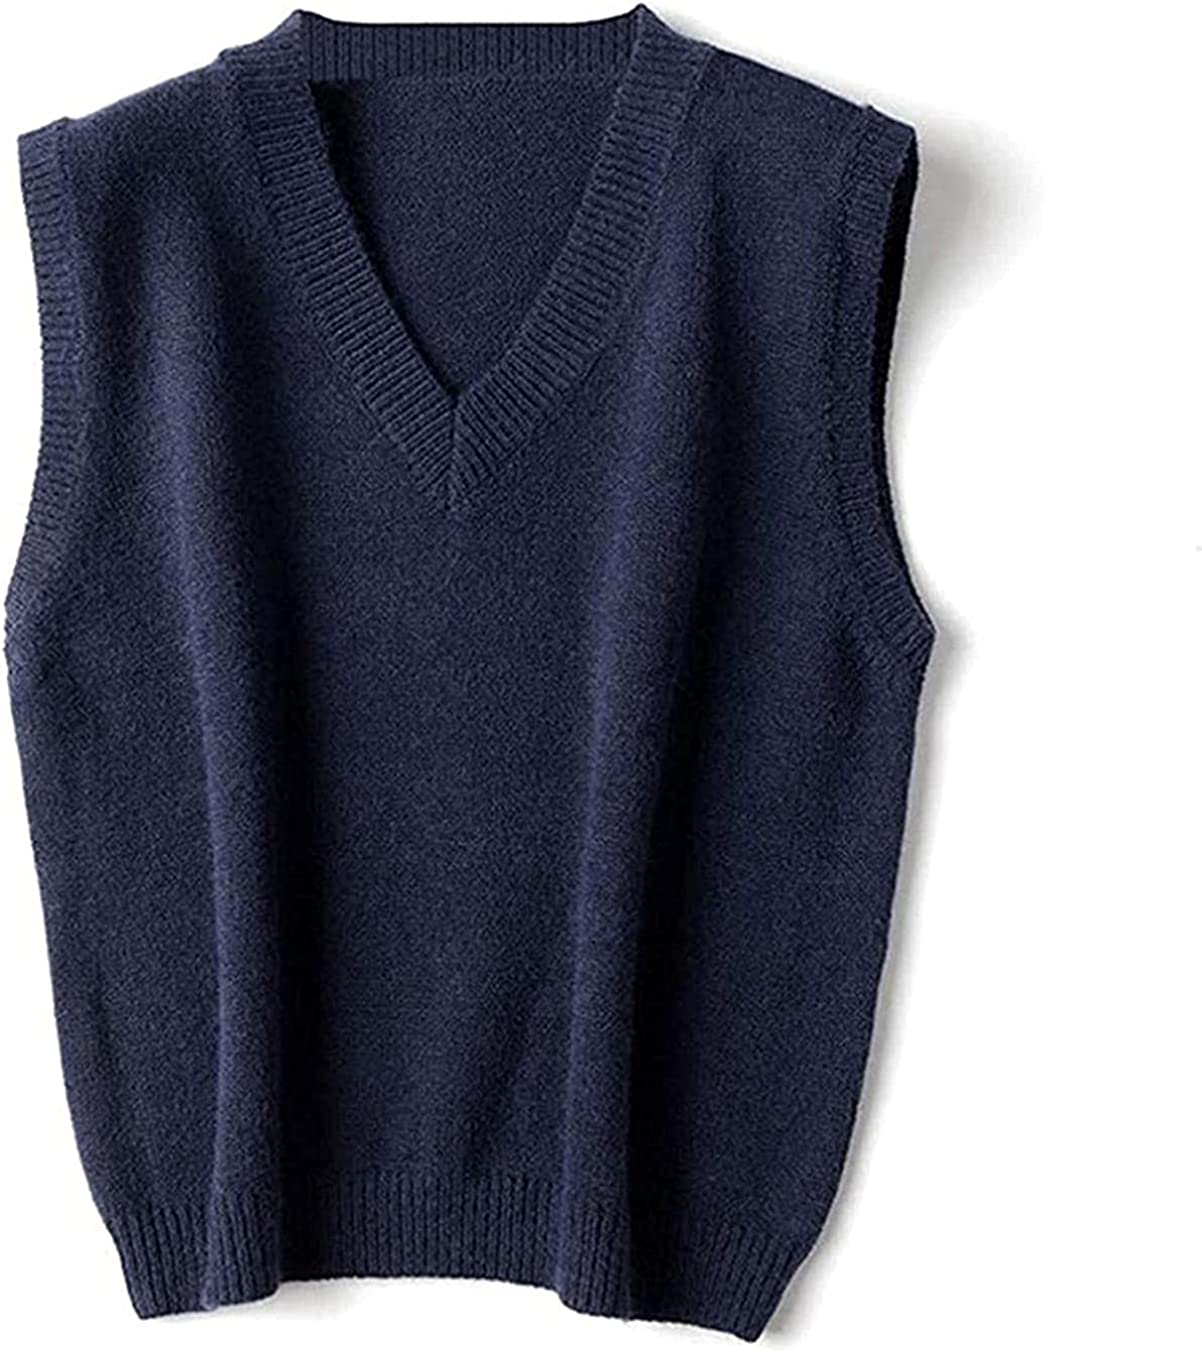 Sweater Vest Women Genuine Free Shipping V-Neck Daily Wais Stylish cheap Sleeveless Students